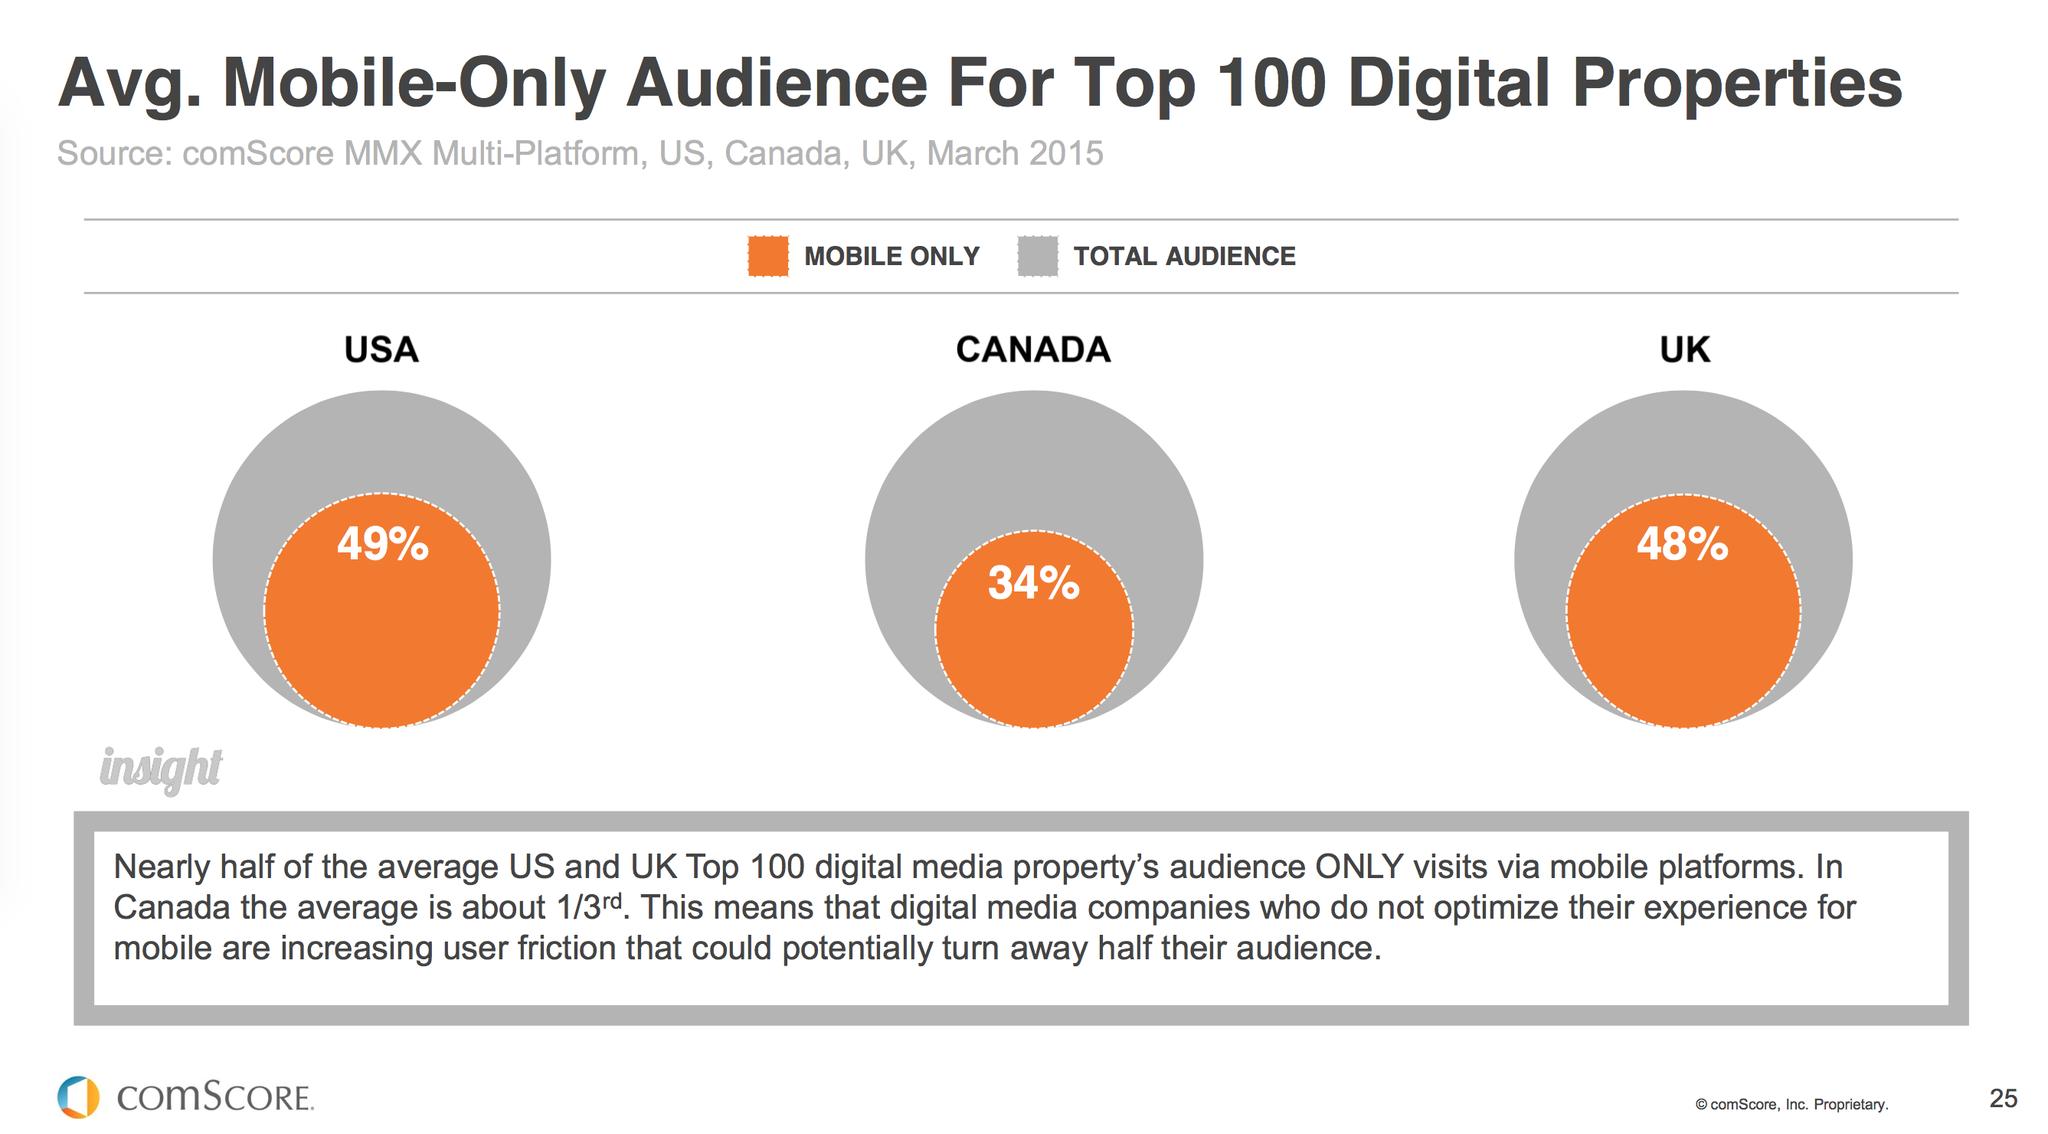 Mobile Audience for Top 100 Digital Properties